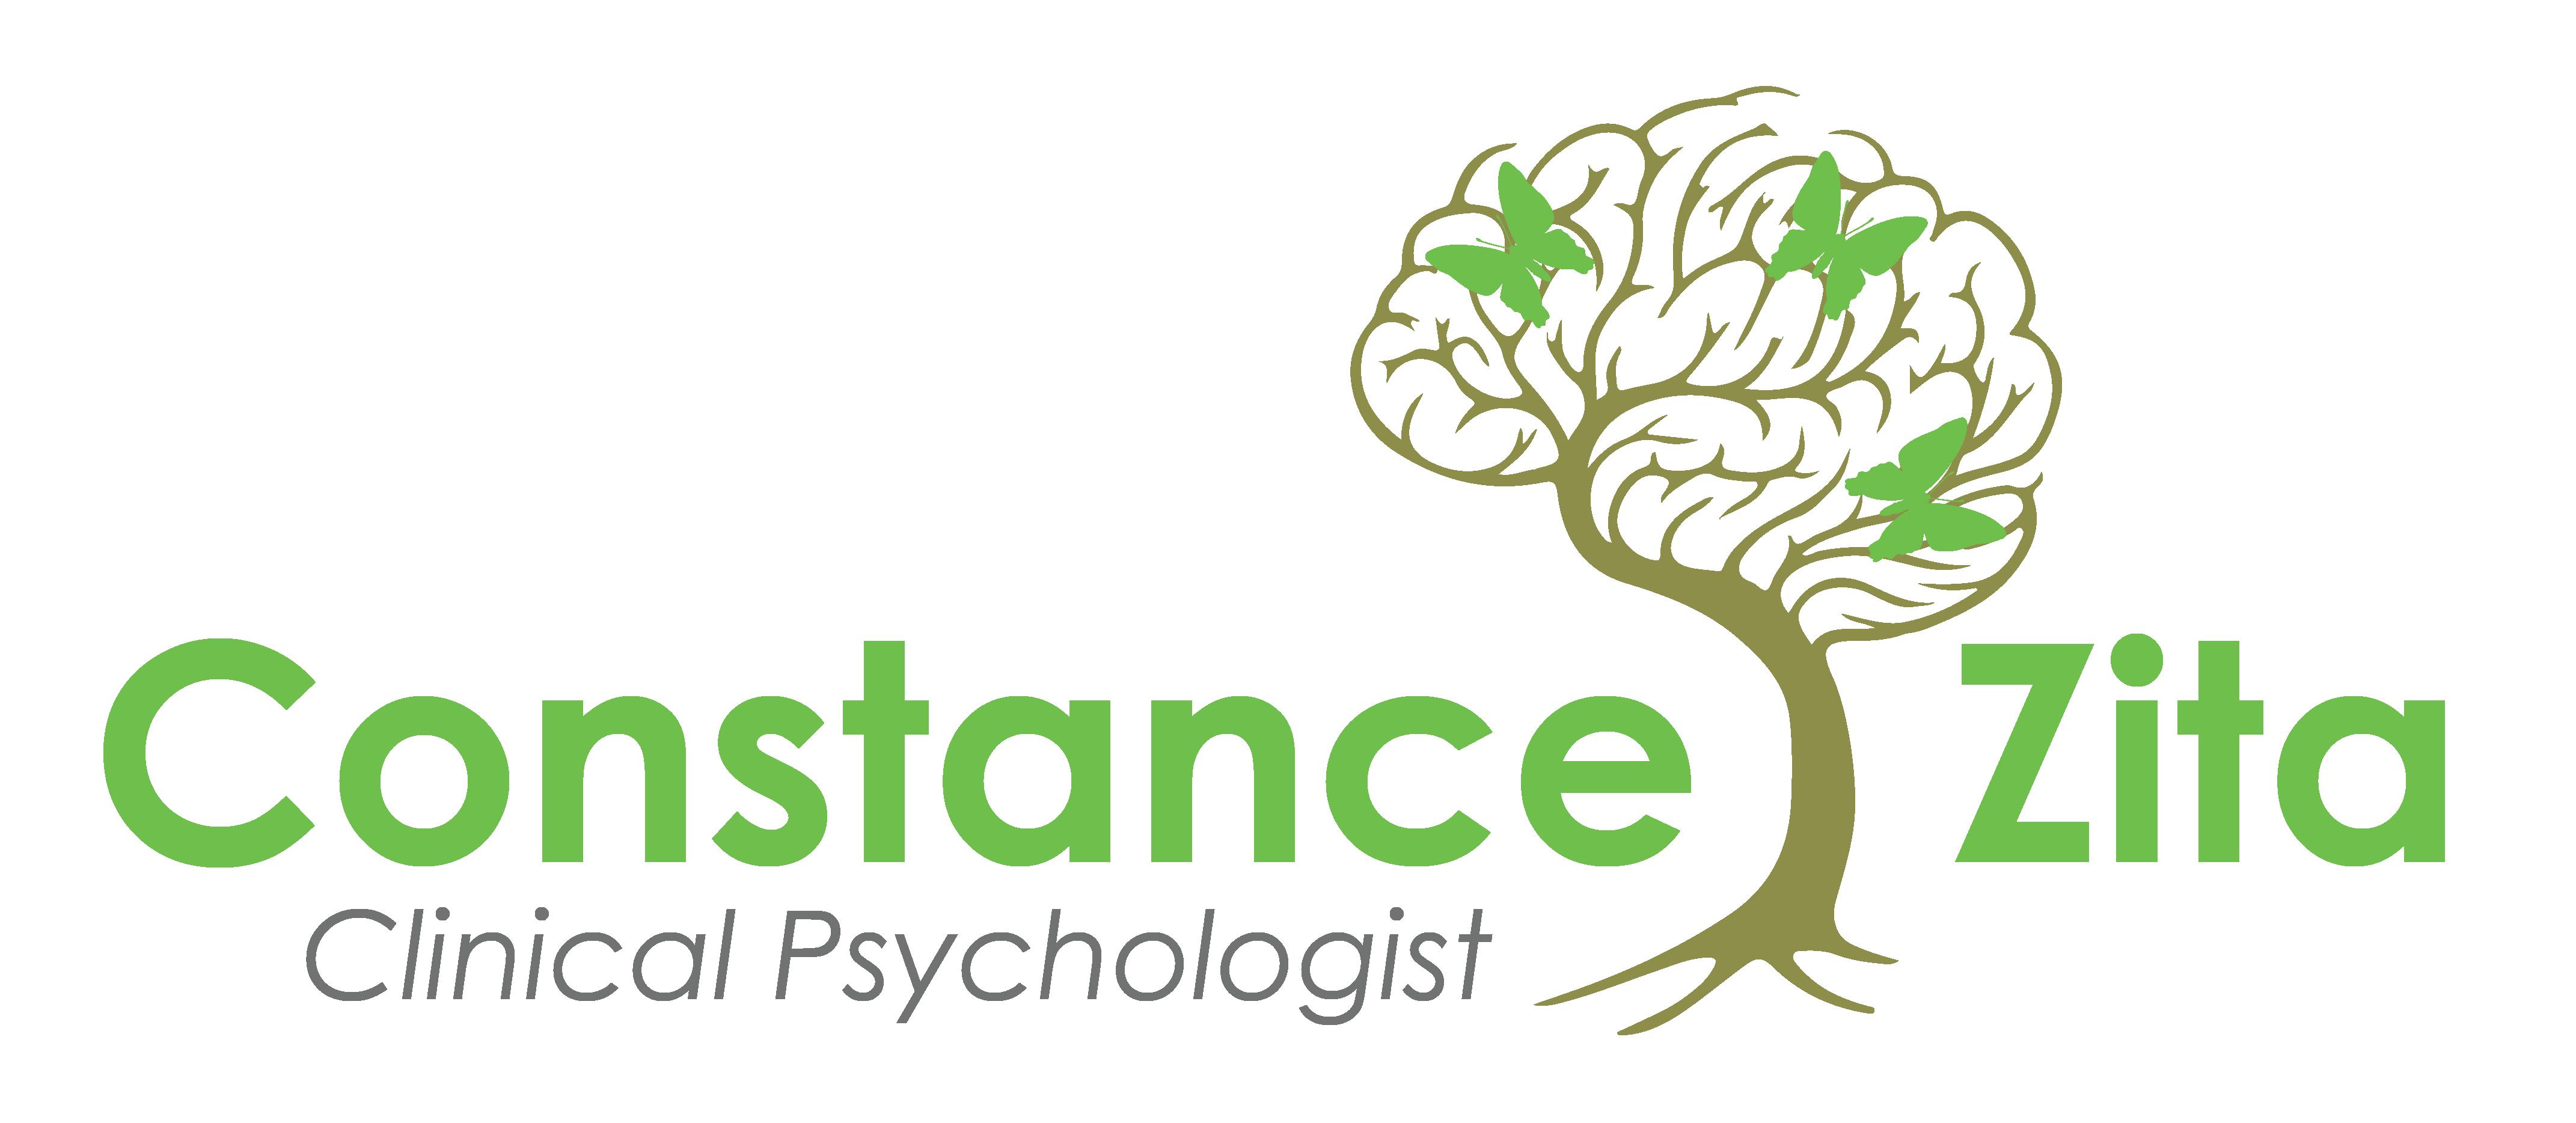 Constance Zita Clinical Psychologist